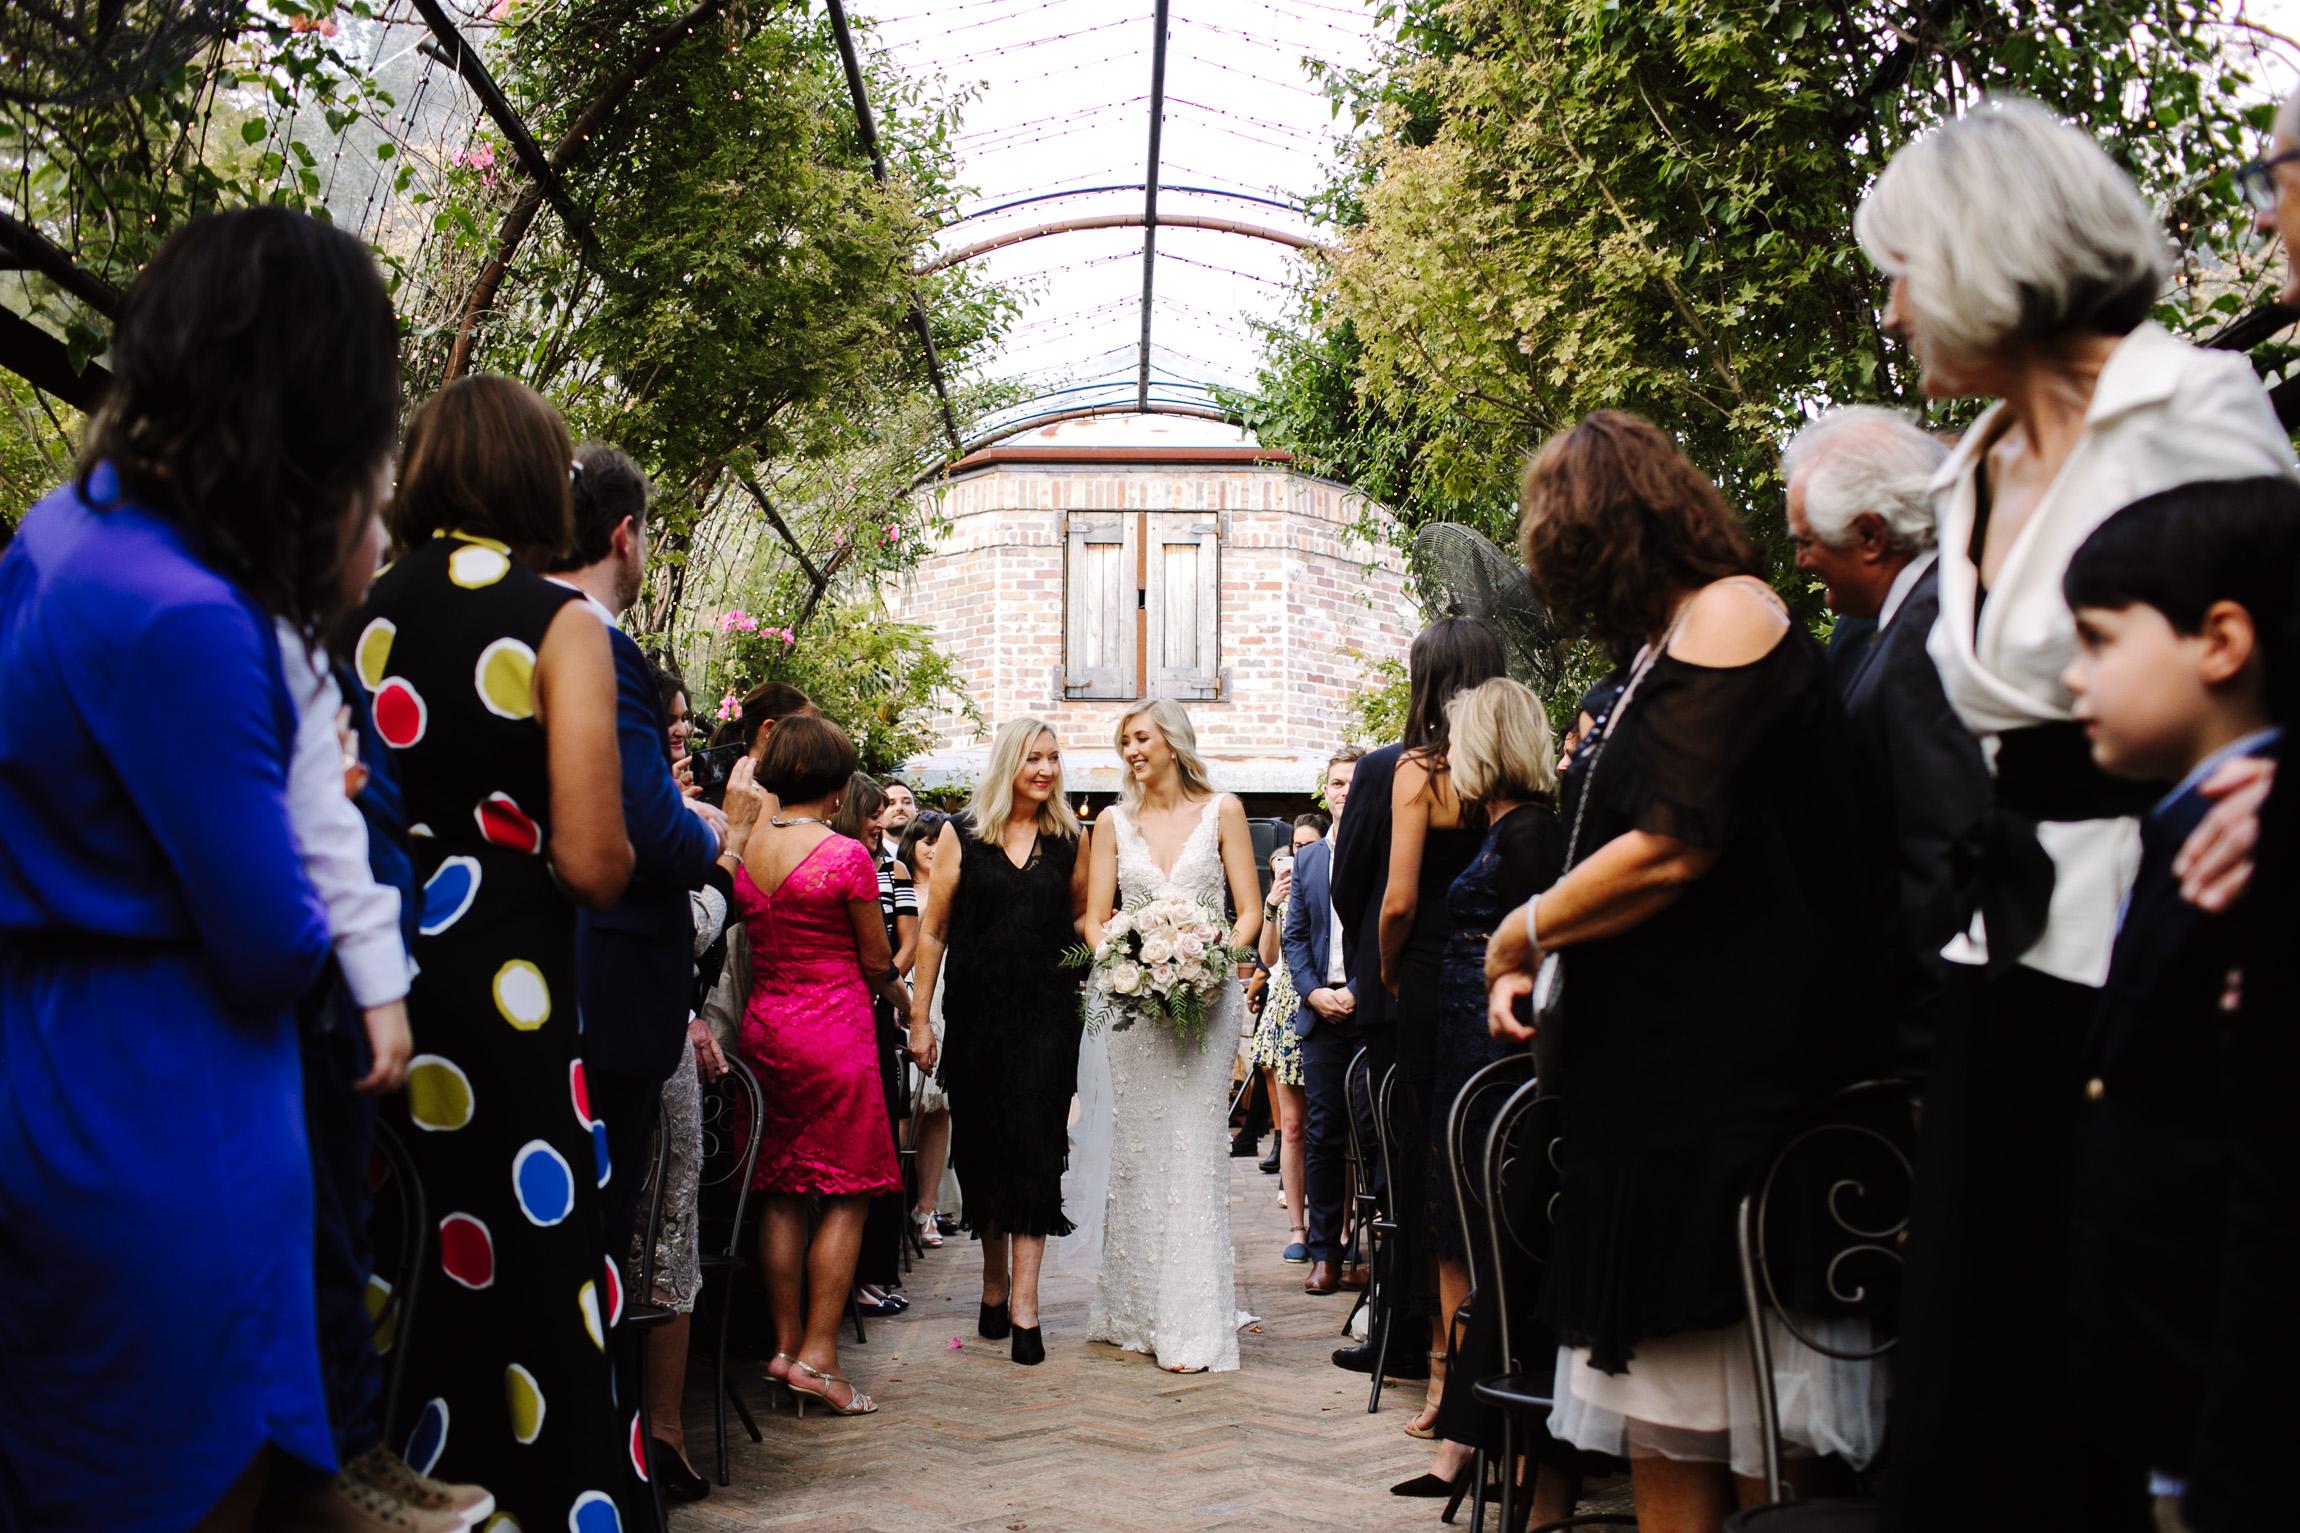 180223_justinaaron_wedding_charlotte_david_h-100.jpg